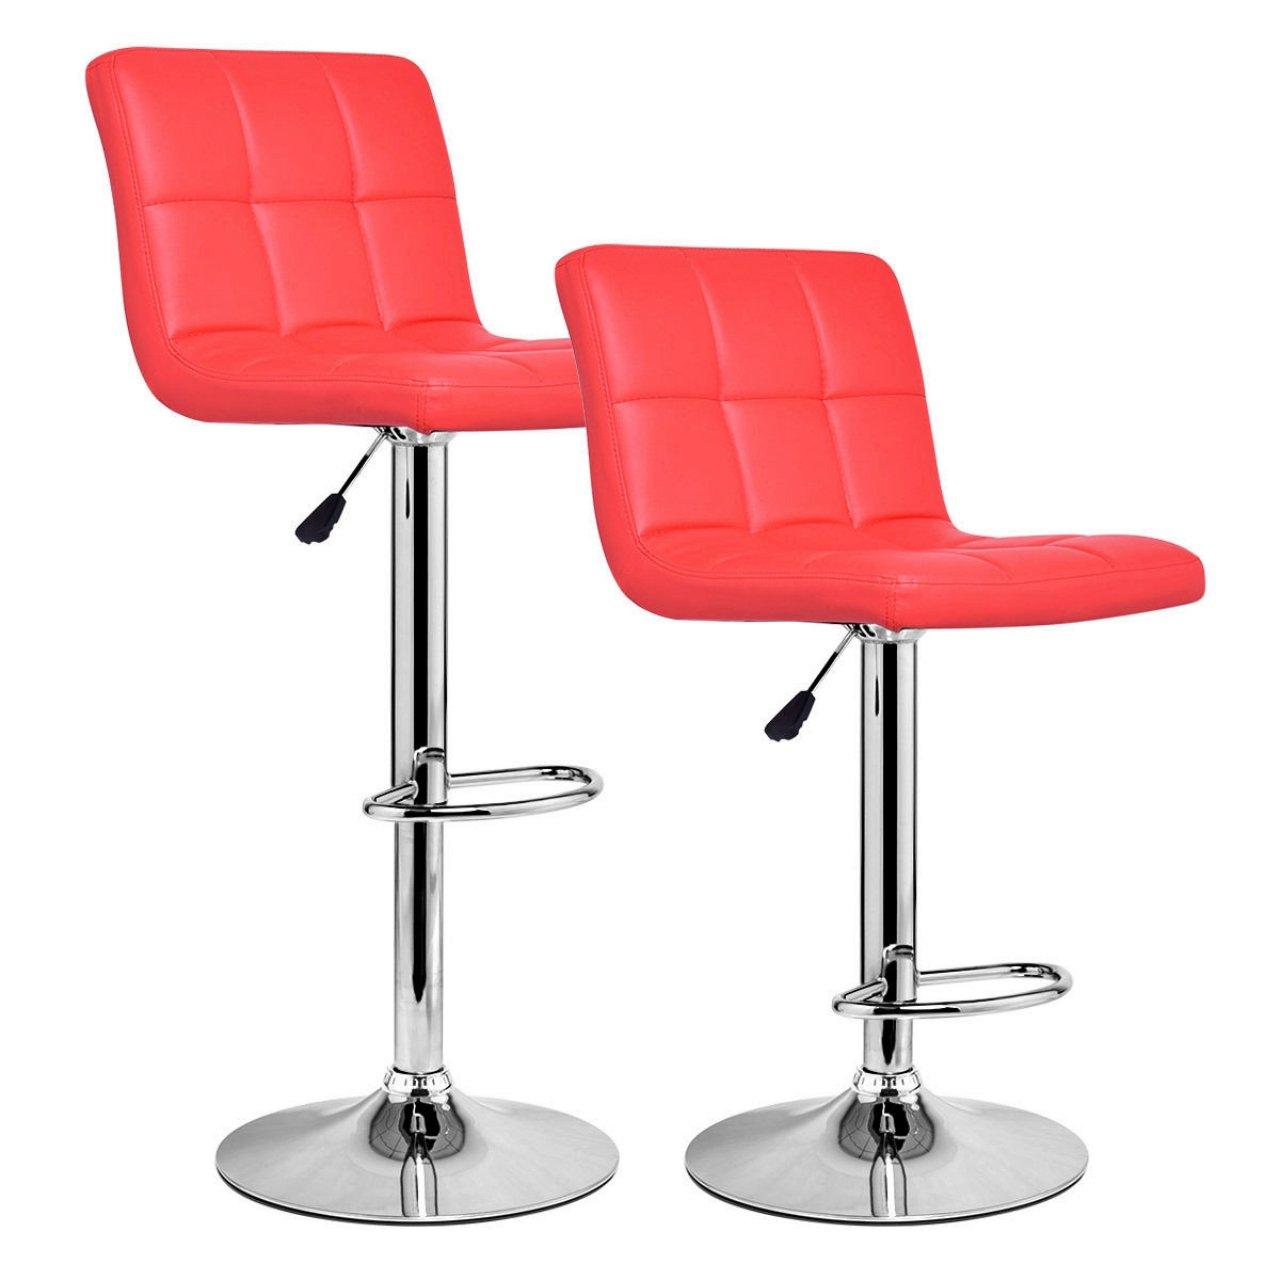 Set Of 2 Bar Stools Anti-aging PU Leather Adjustable Barstool 360 Degree Swivel Pub Style Comfortable Backrest/Red #827